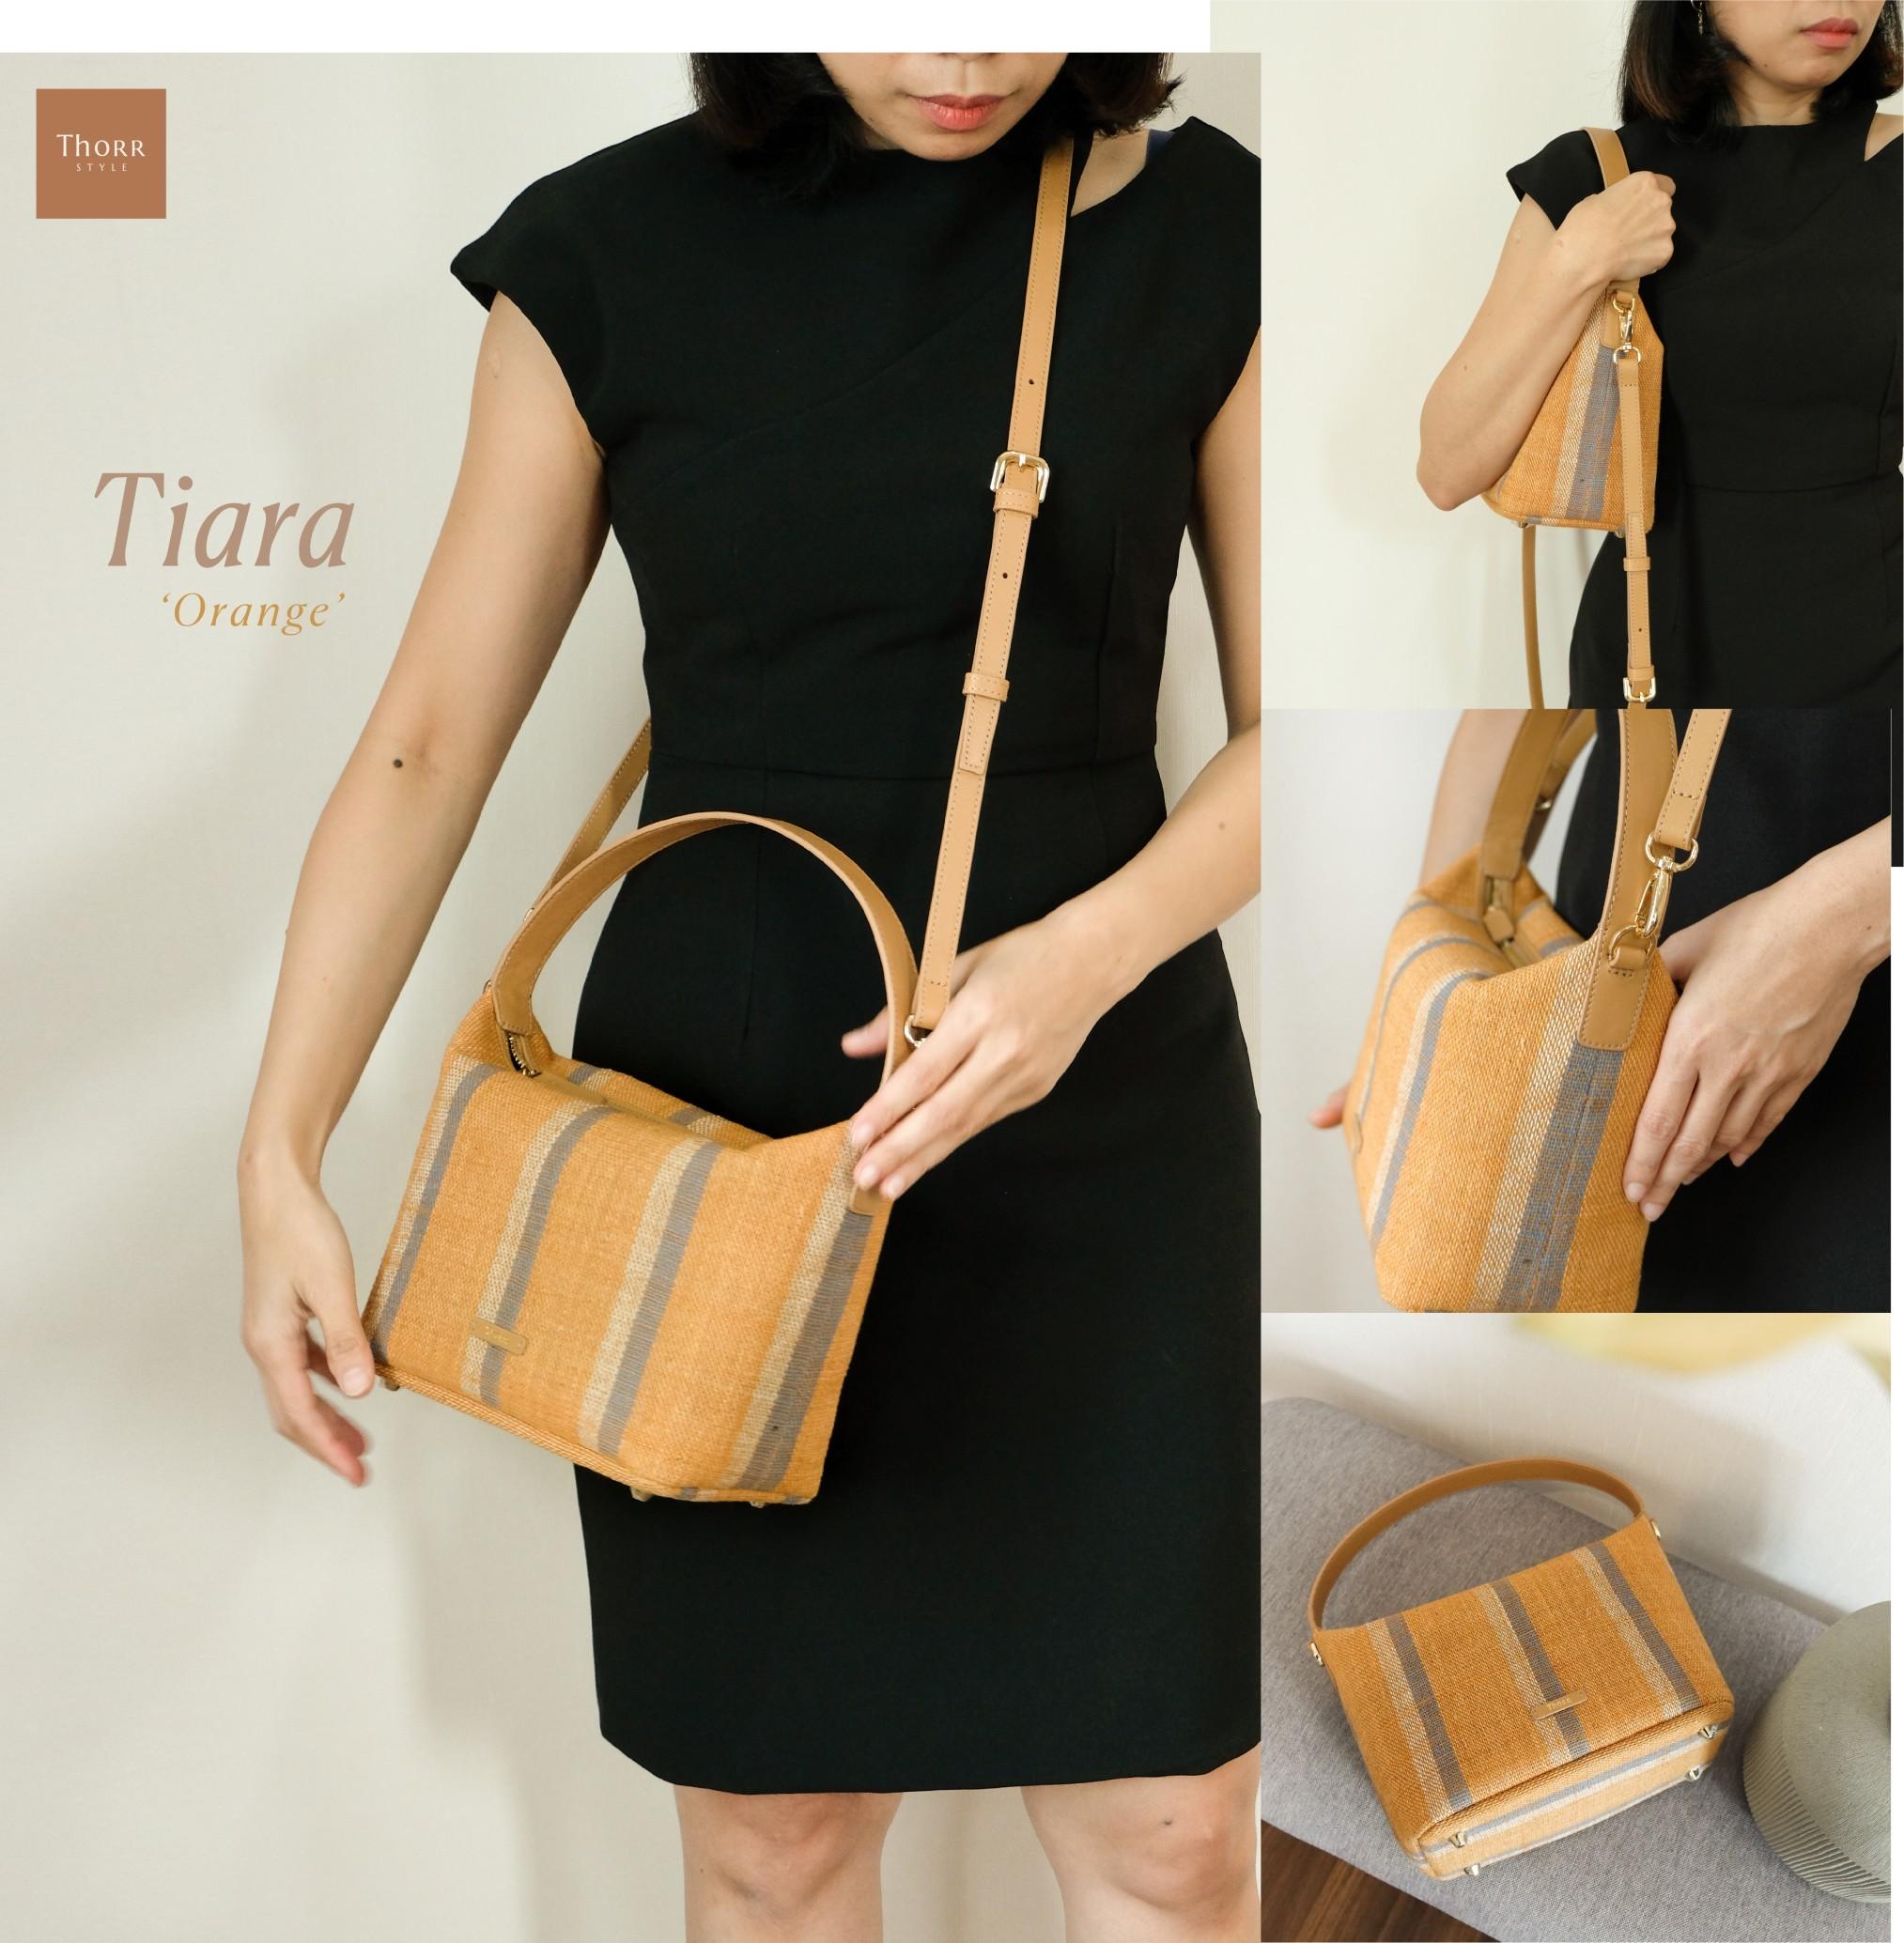 Tiara Orange bag BG-139